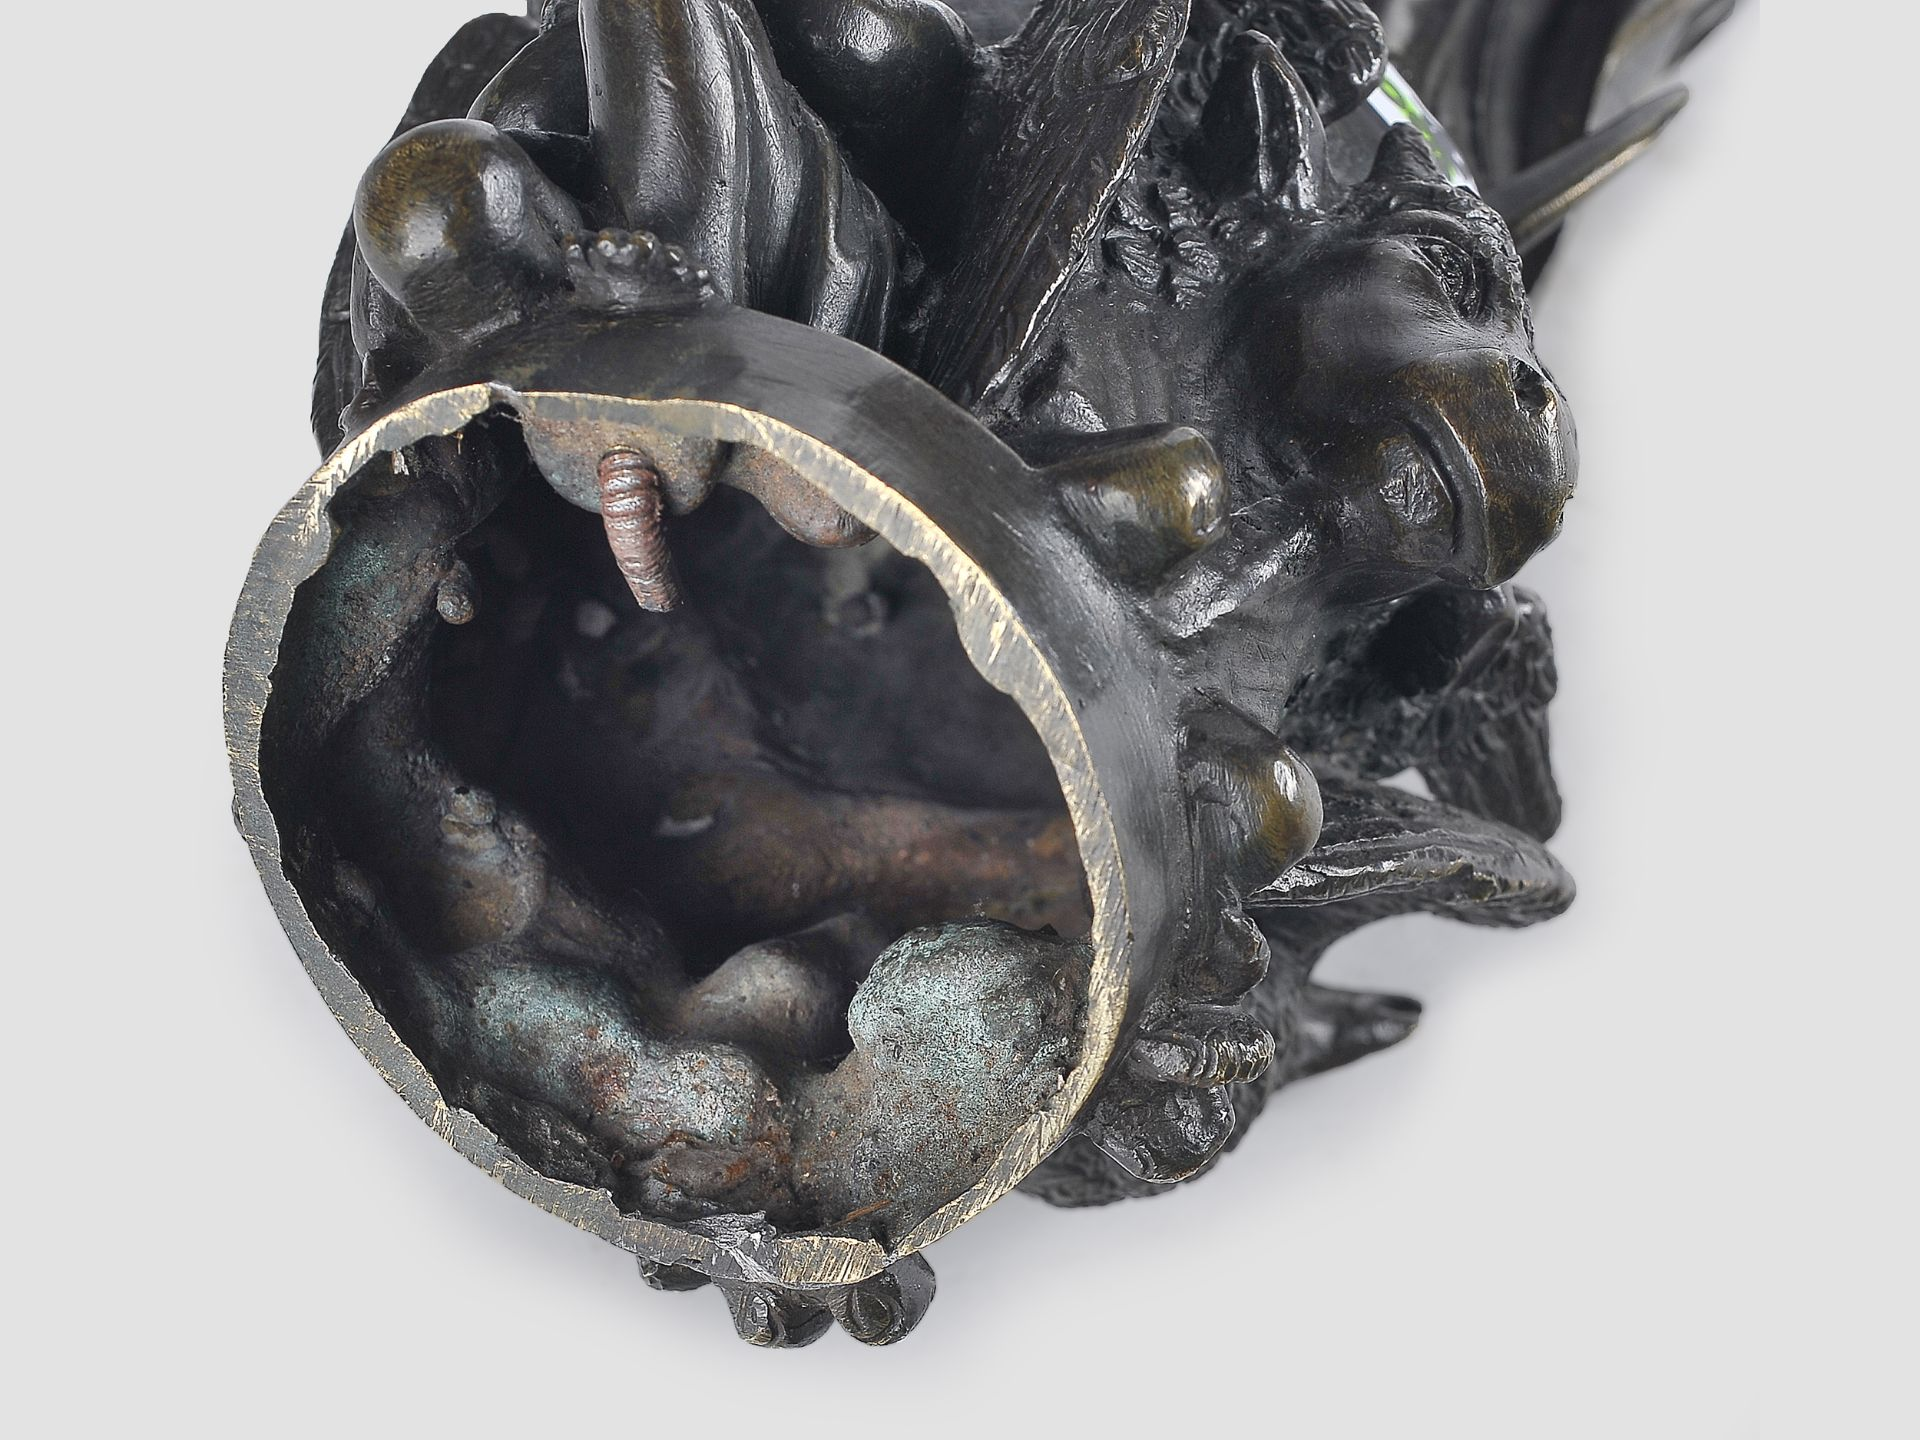 Maria Immaculata, Barock, 17. / 19. Jahrhundert, Bronze - Image 8 of 9